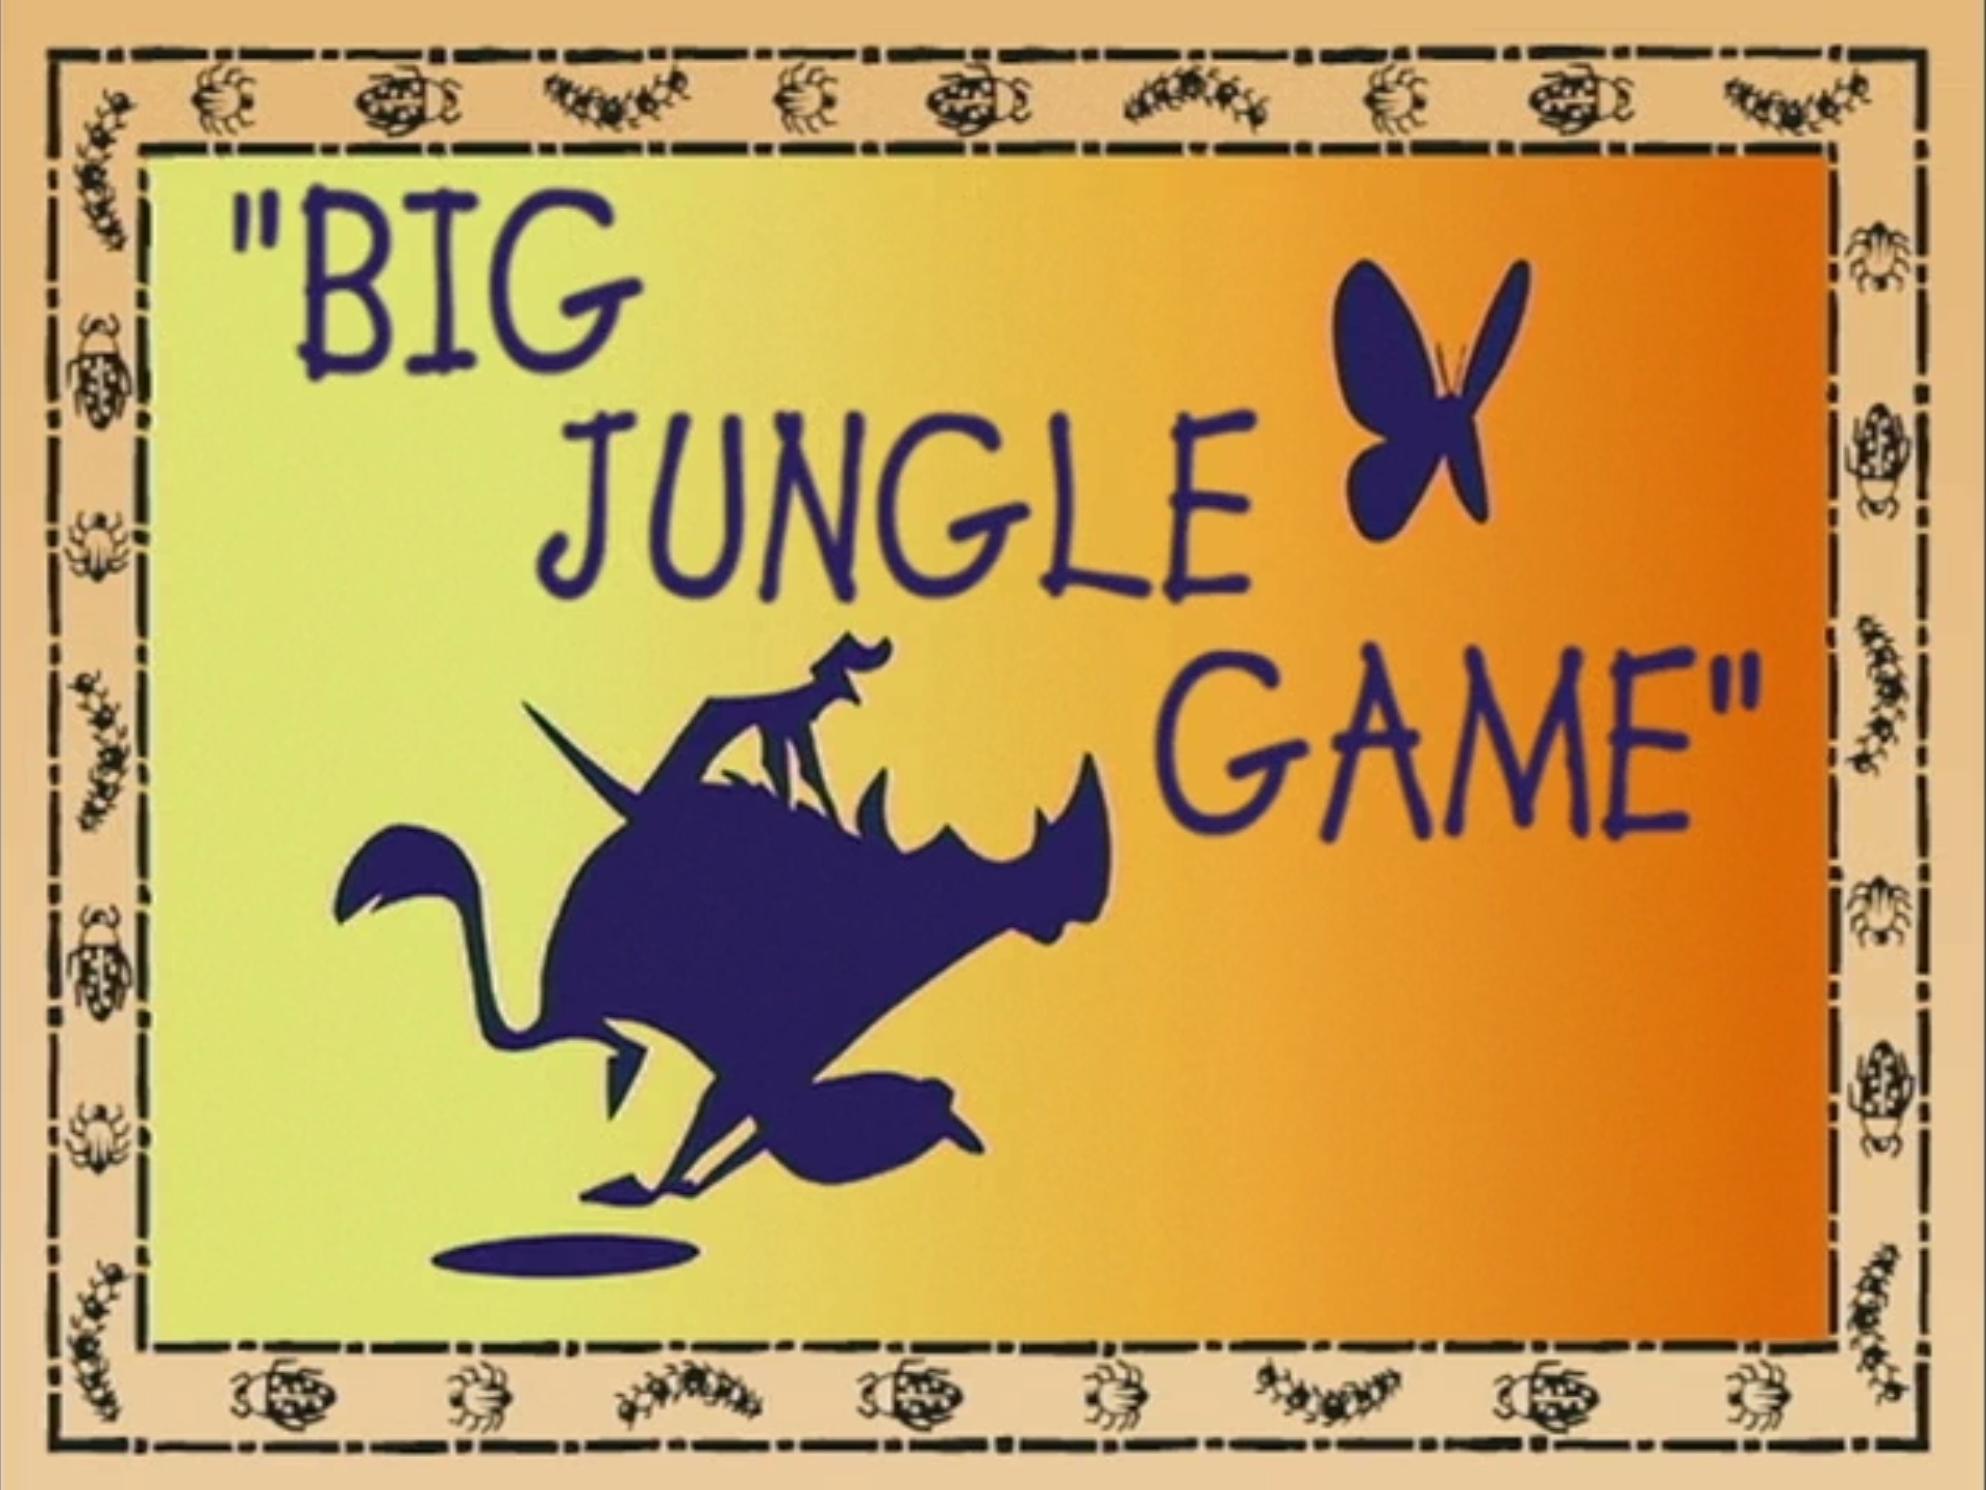 Big Jungle Game